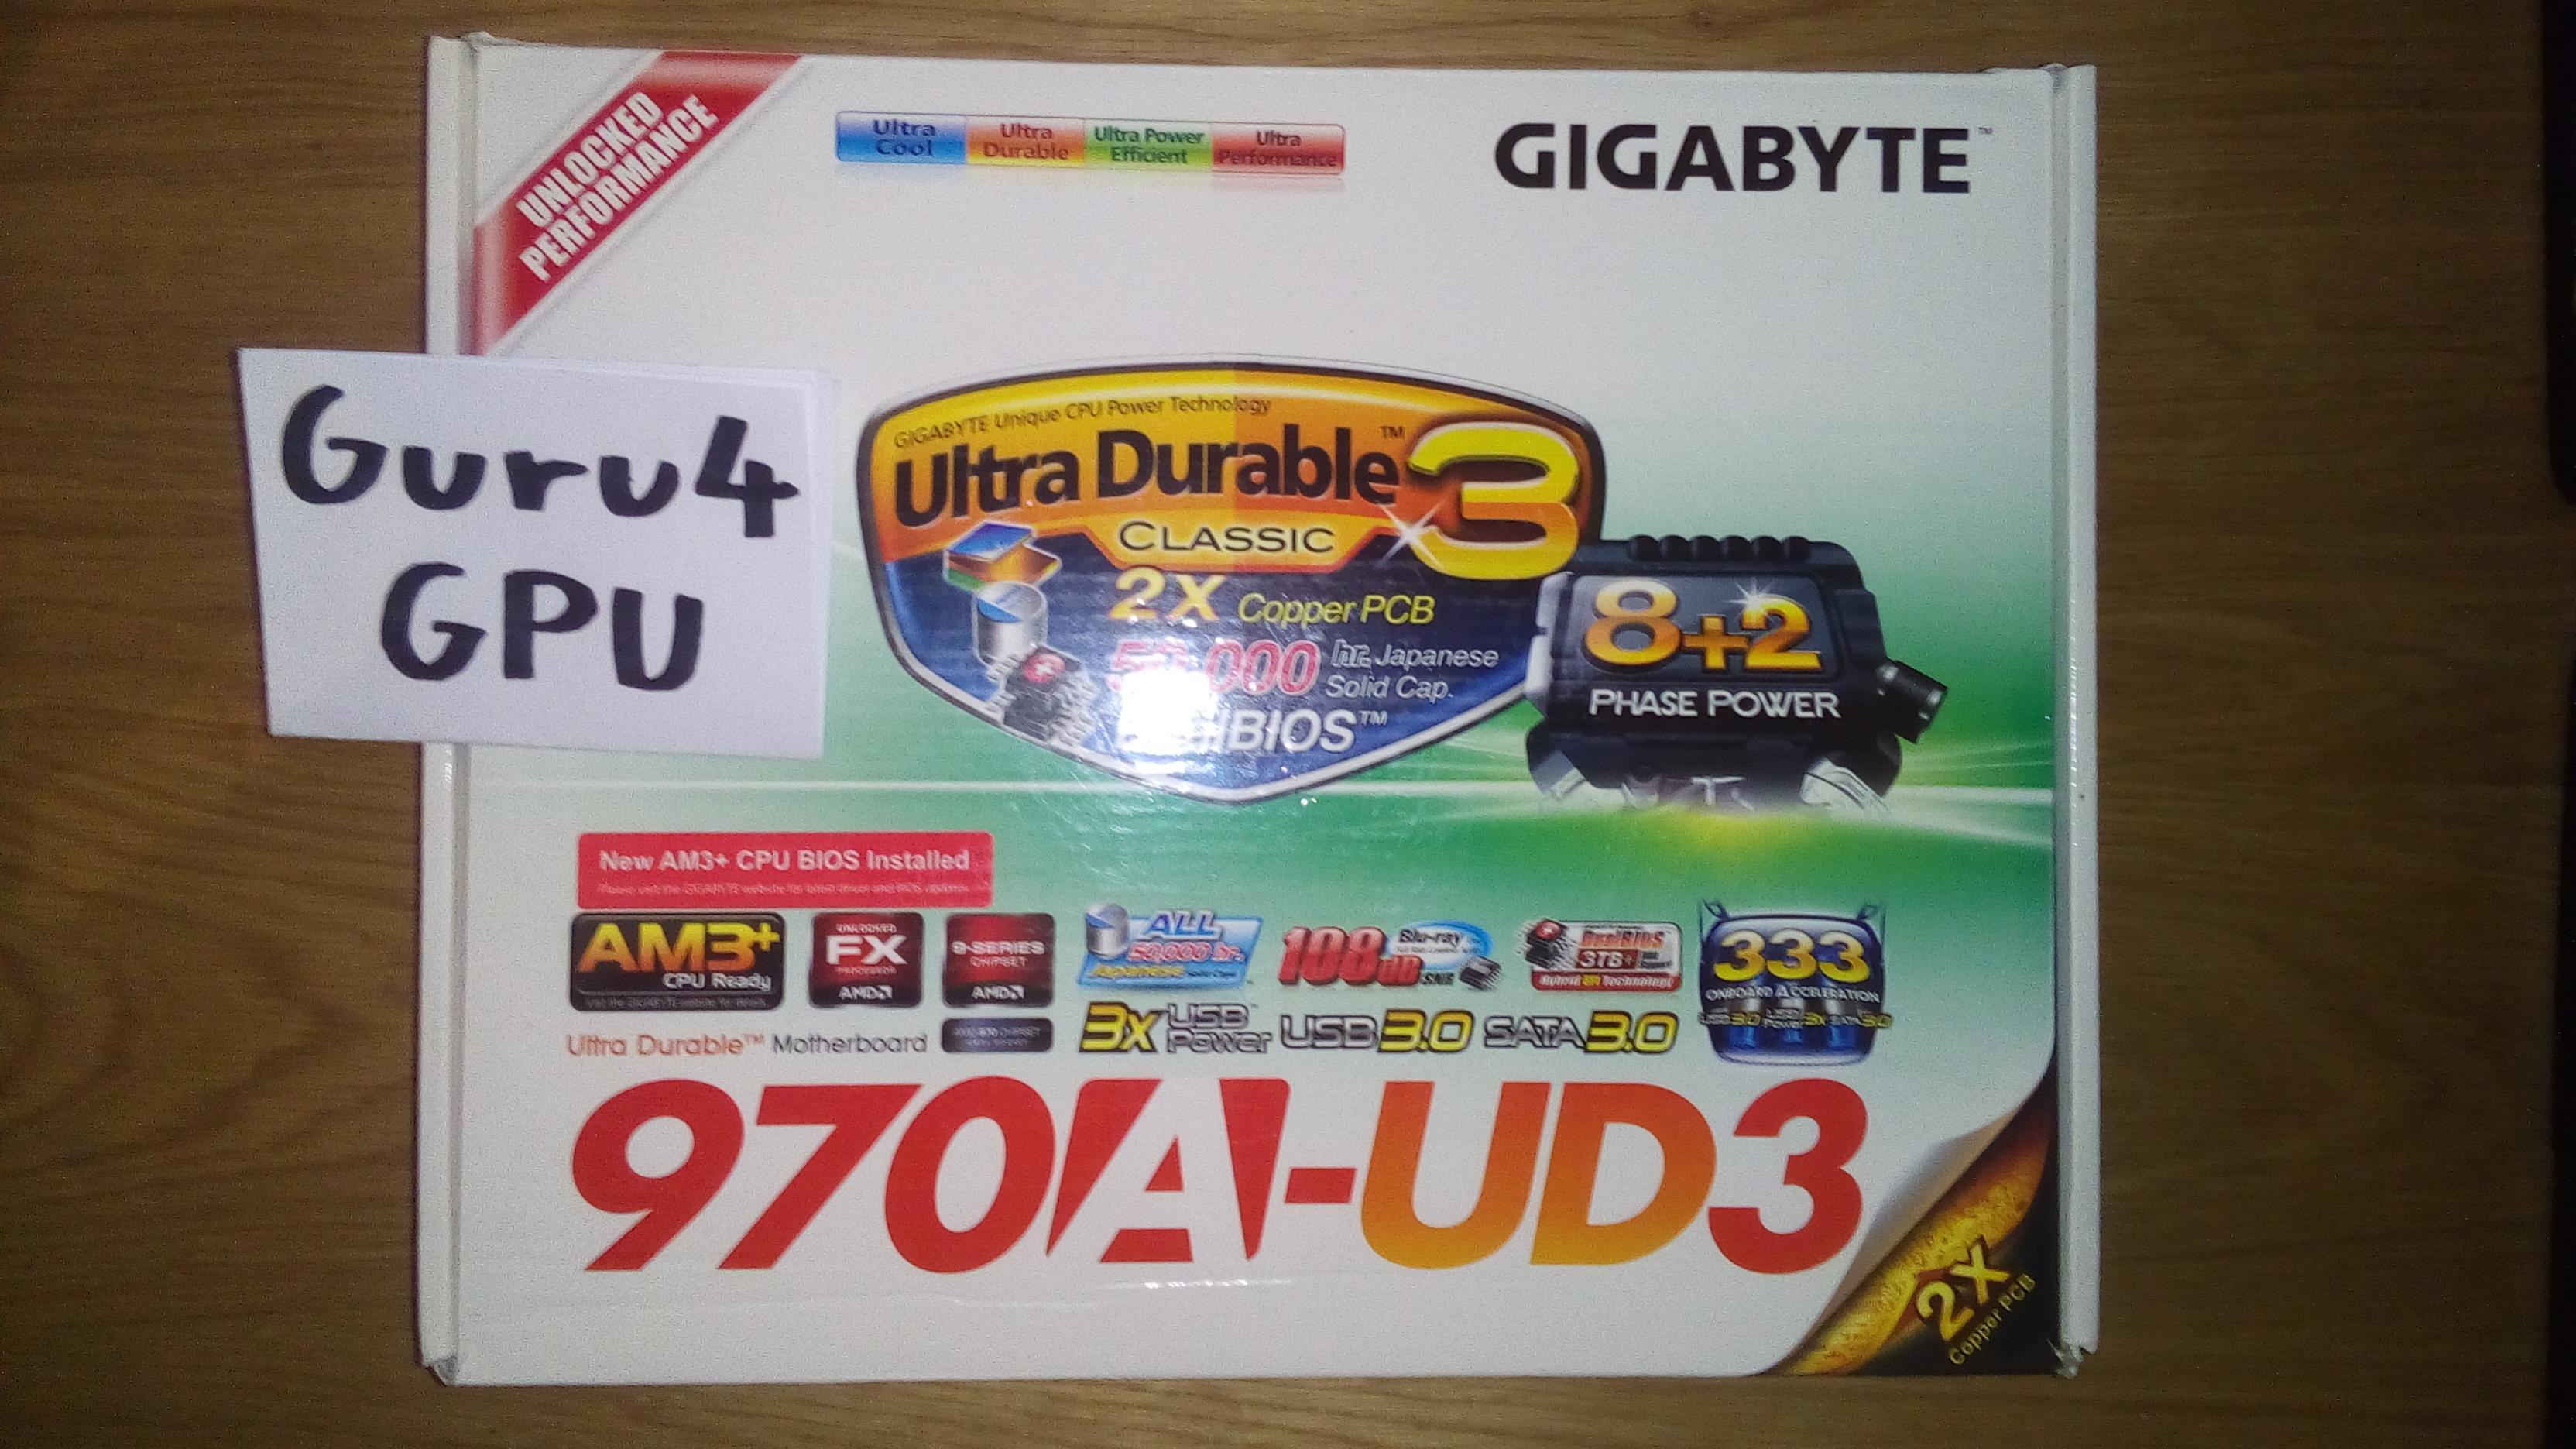 AMD FX-6100 + Gigabyte GA-970A-UD3 Bundle 1